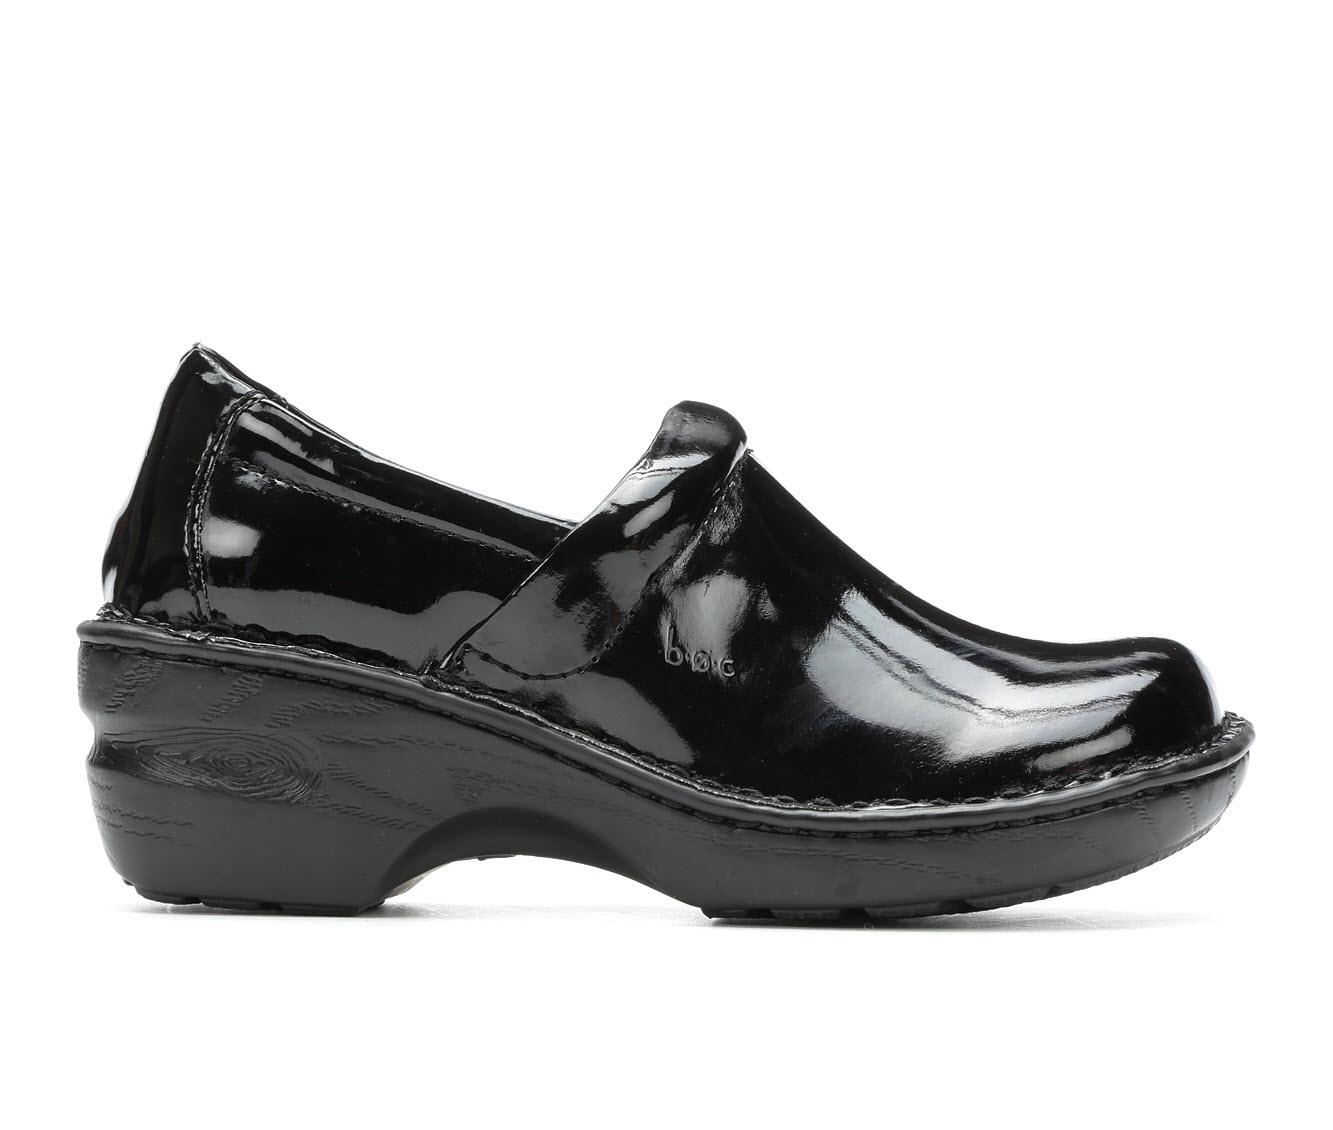 B.O.C. Peggy Women's Shoe (Black Faux Leather)